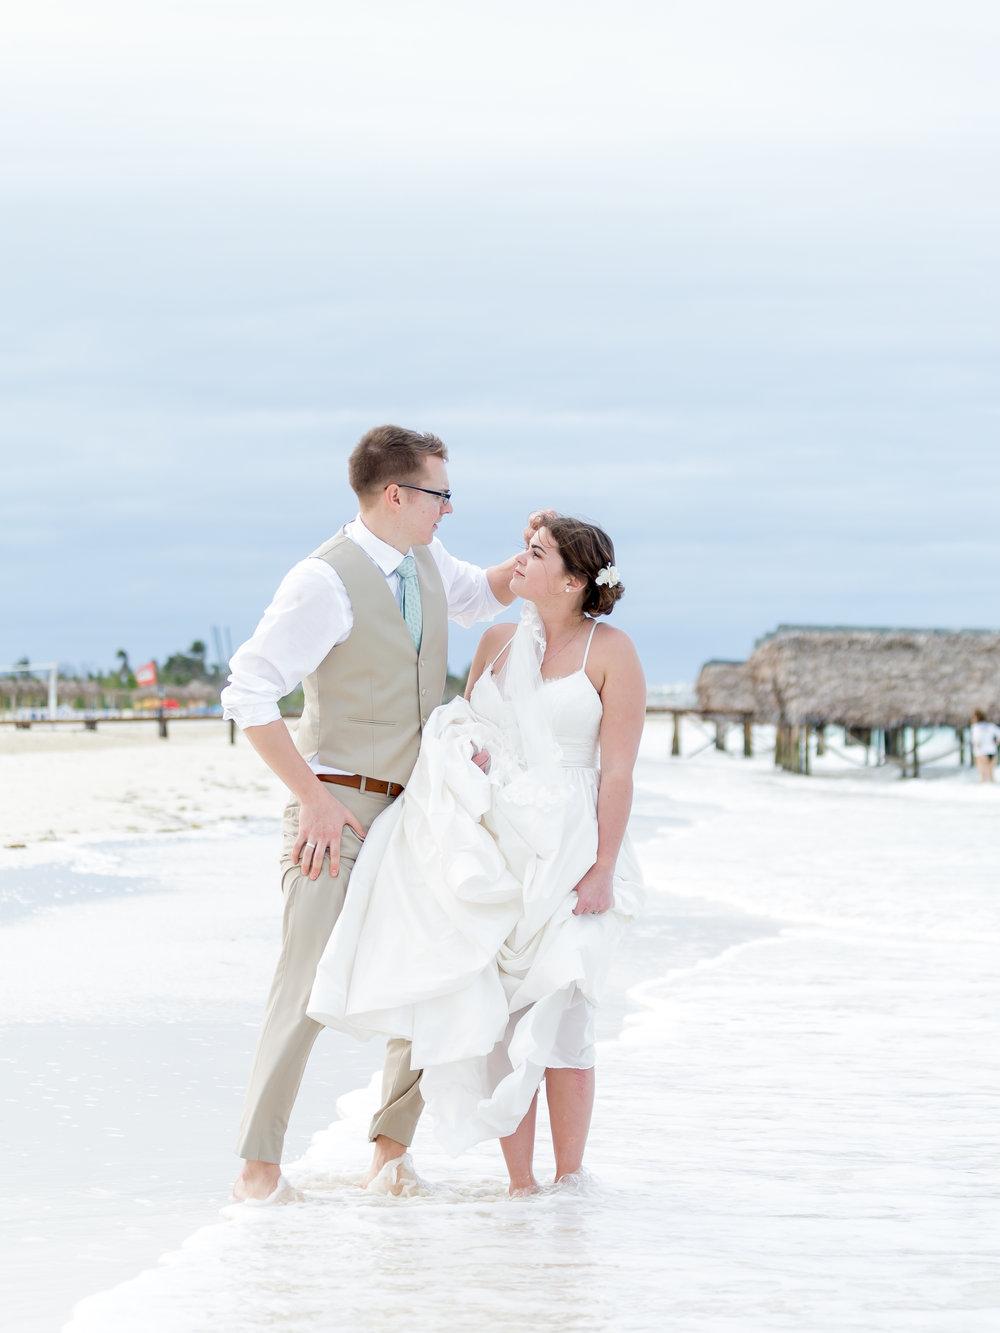 Cayco-Coco-Cuba-Wedding-554.jpg